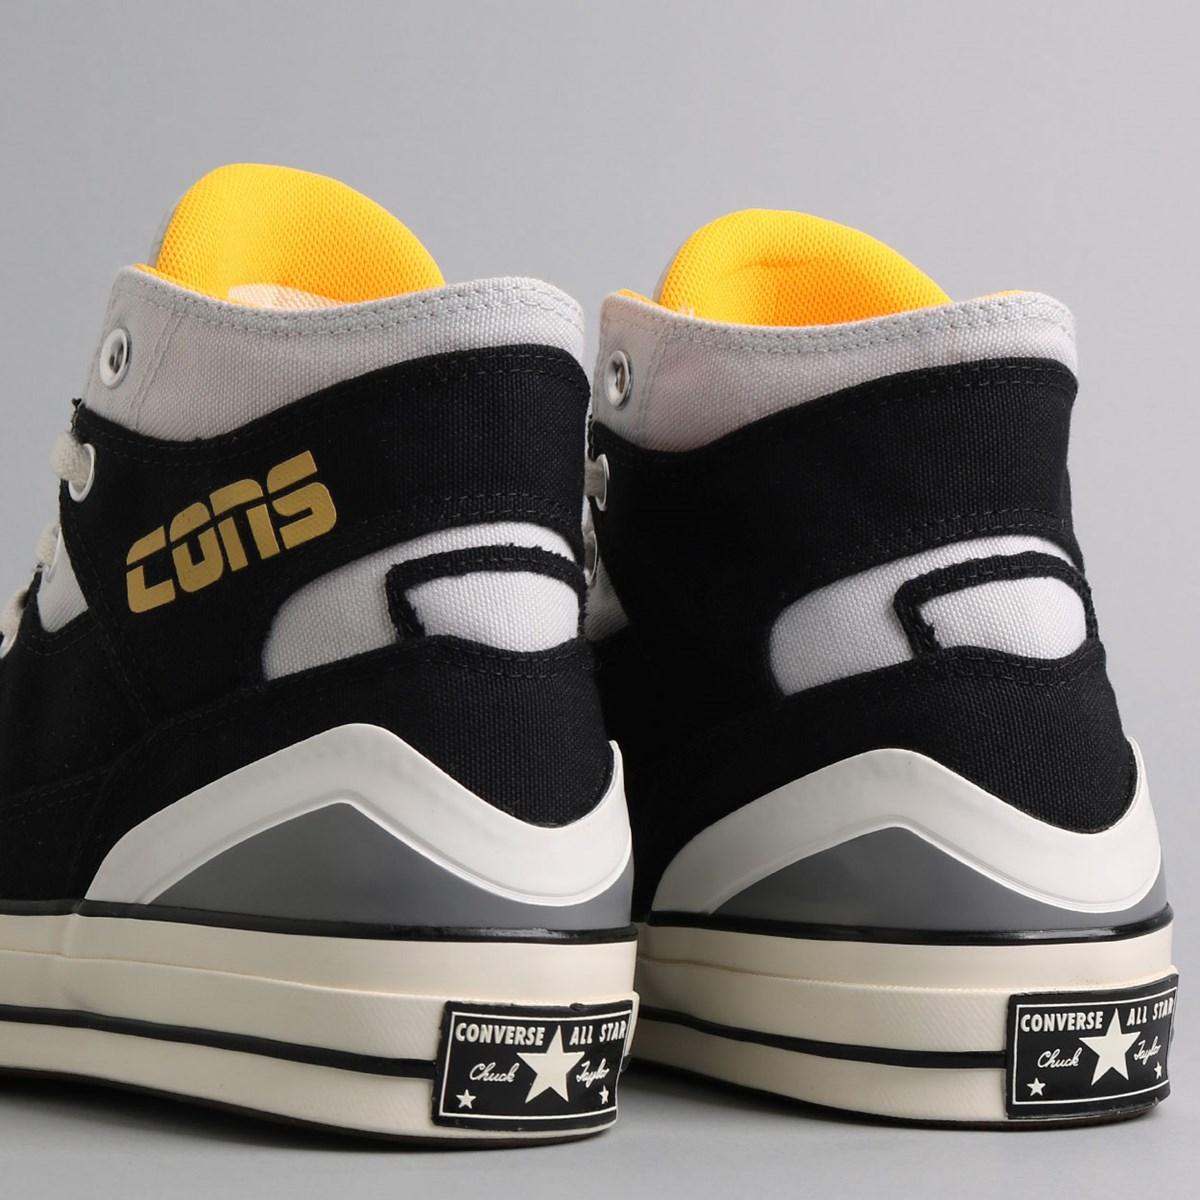 Tênis Converse Chuck 70 E260 Hi Black Laser Orange Photon Dust 167055C